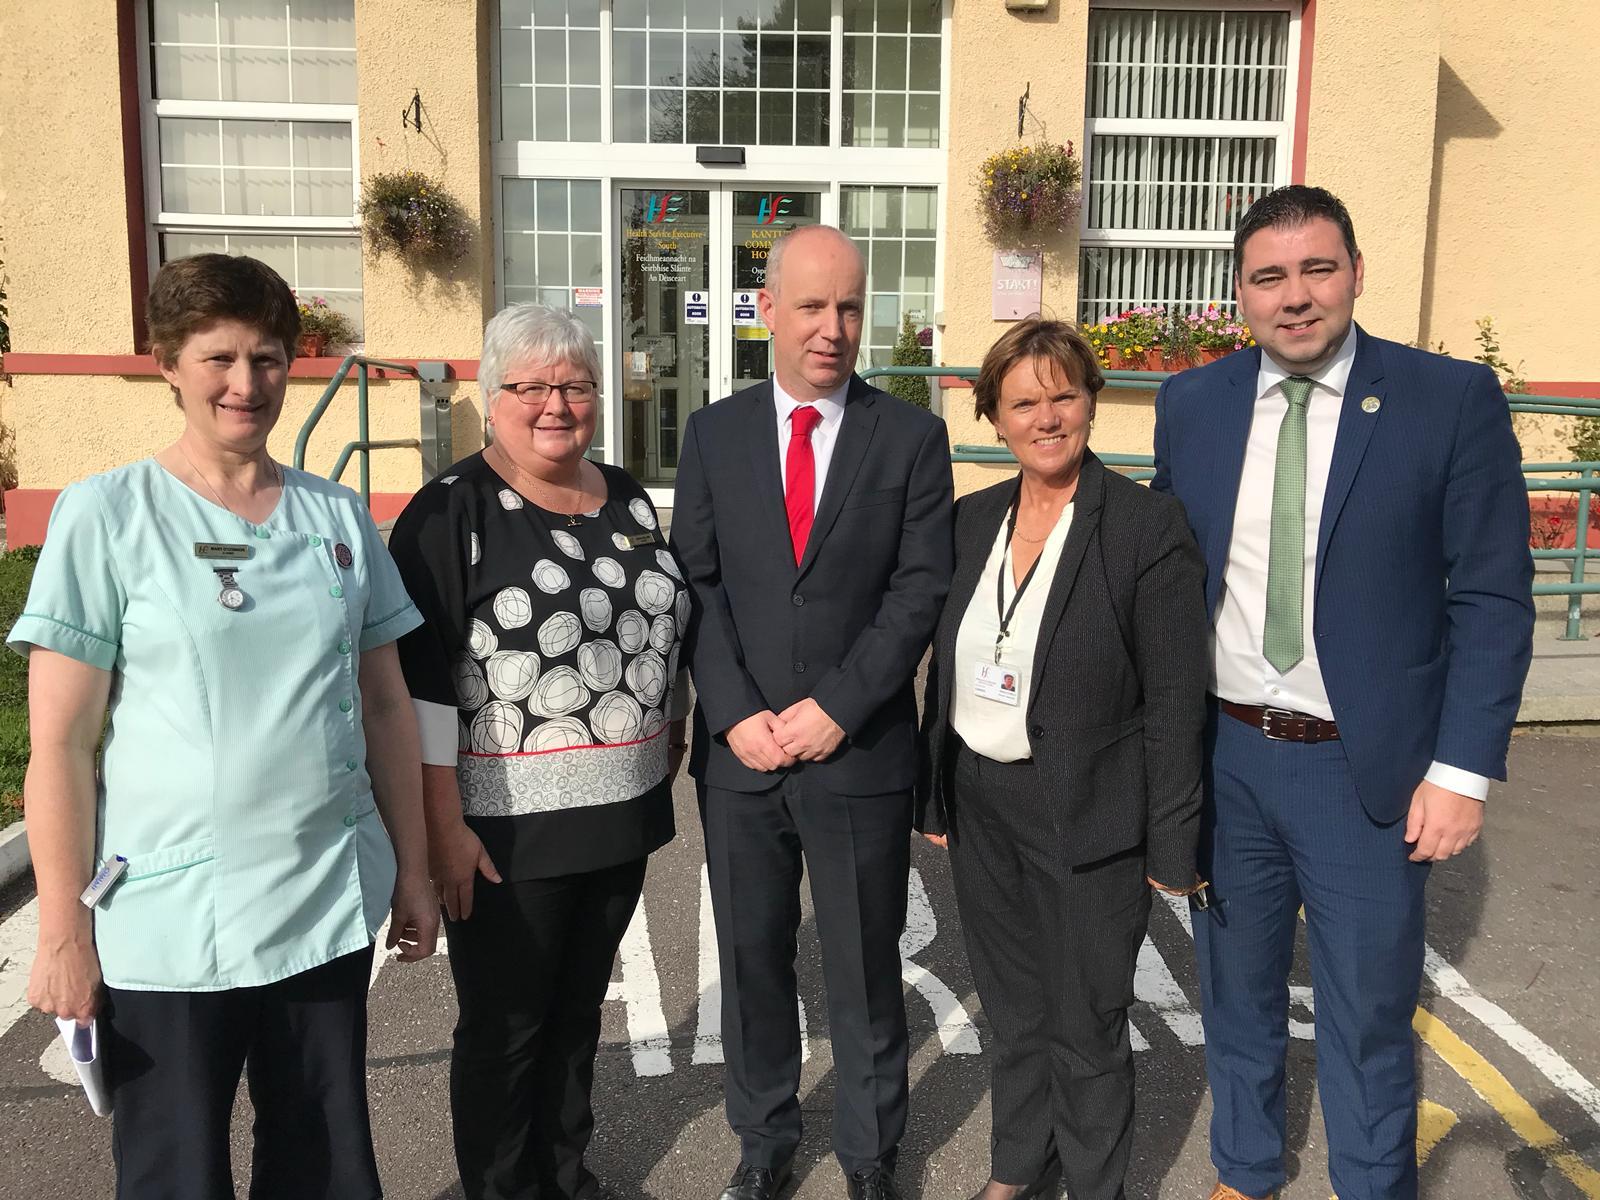 Minister Daly Visits Millstreet & Kanturk Community Hospitals